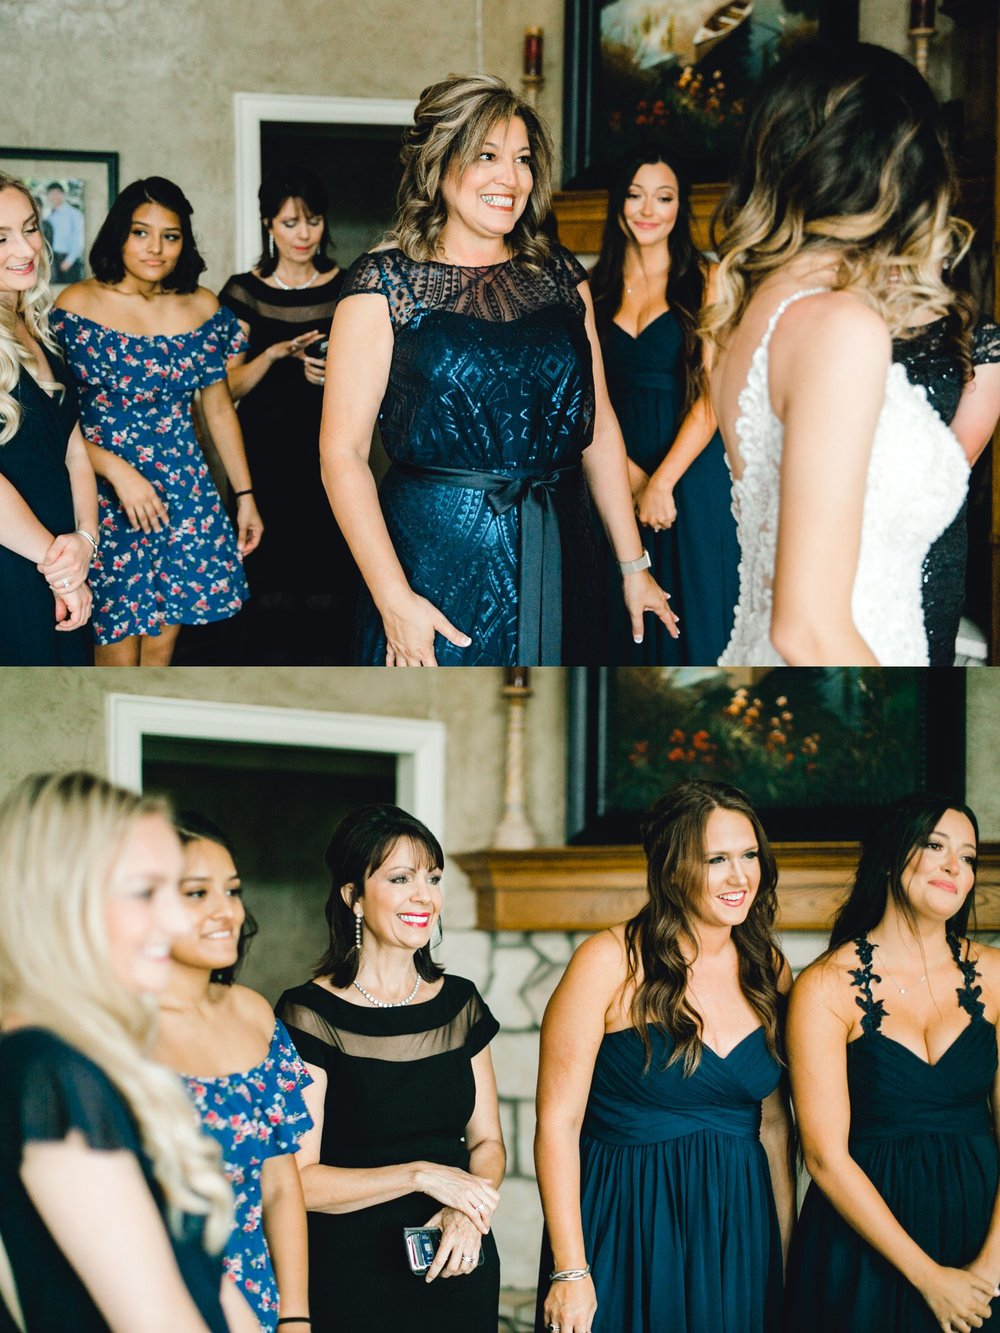 Ashley_John_English_Elegant_Texas_Wedding_Outdoors_Ranch_Caprock_Winery_ALLEEJ_0006.jpg